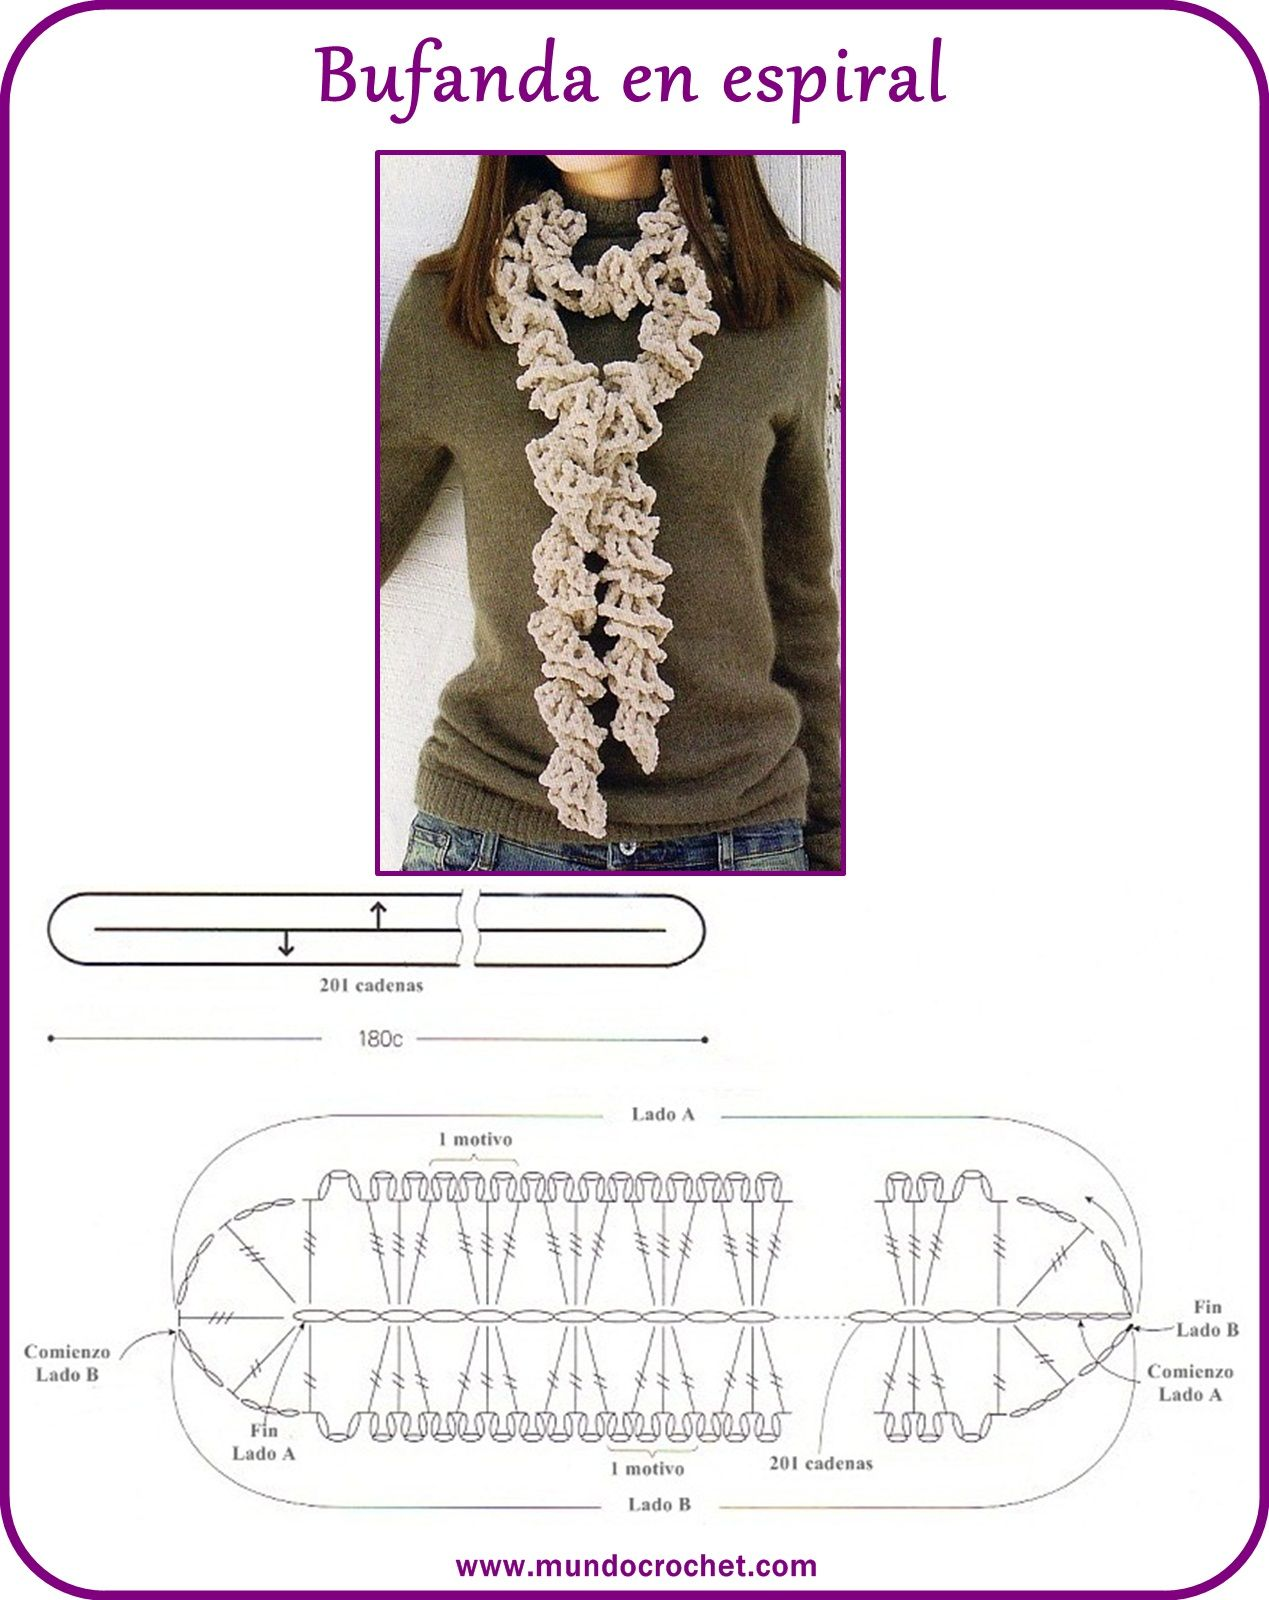 Spiral scarf with diagram - Bufanda a crochet en espiral | Crochet ...